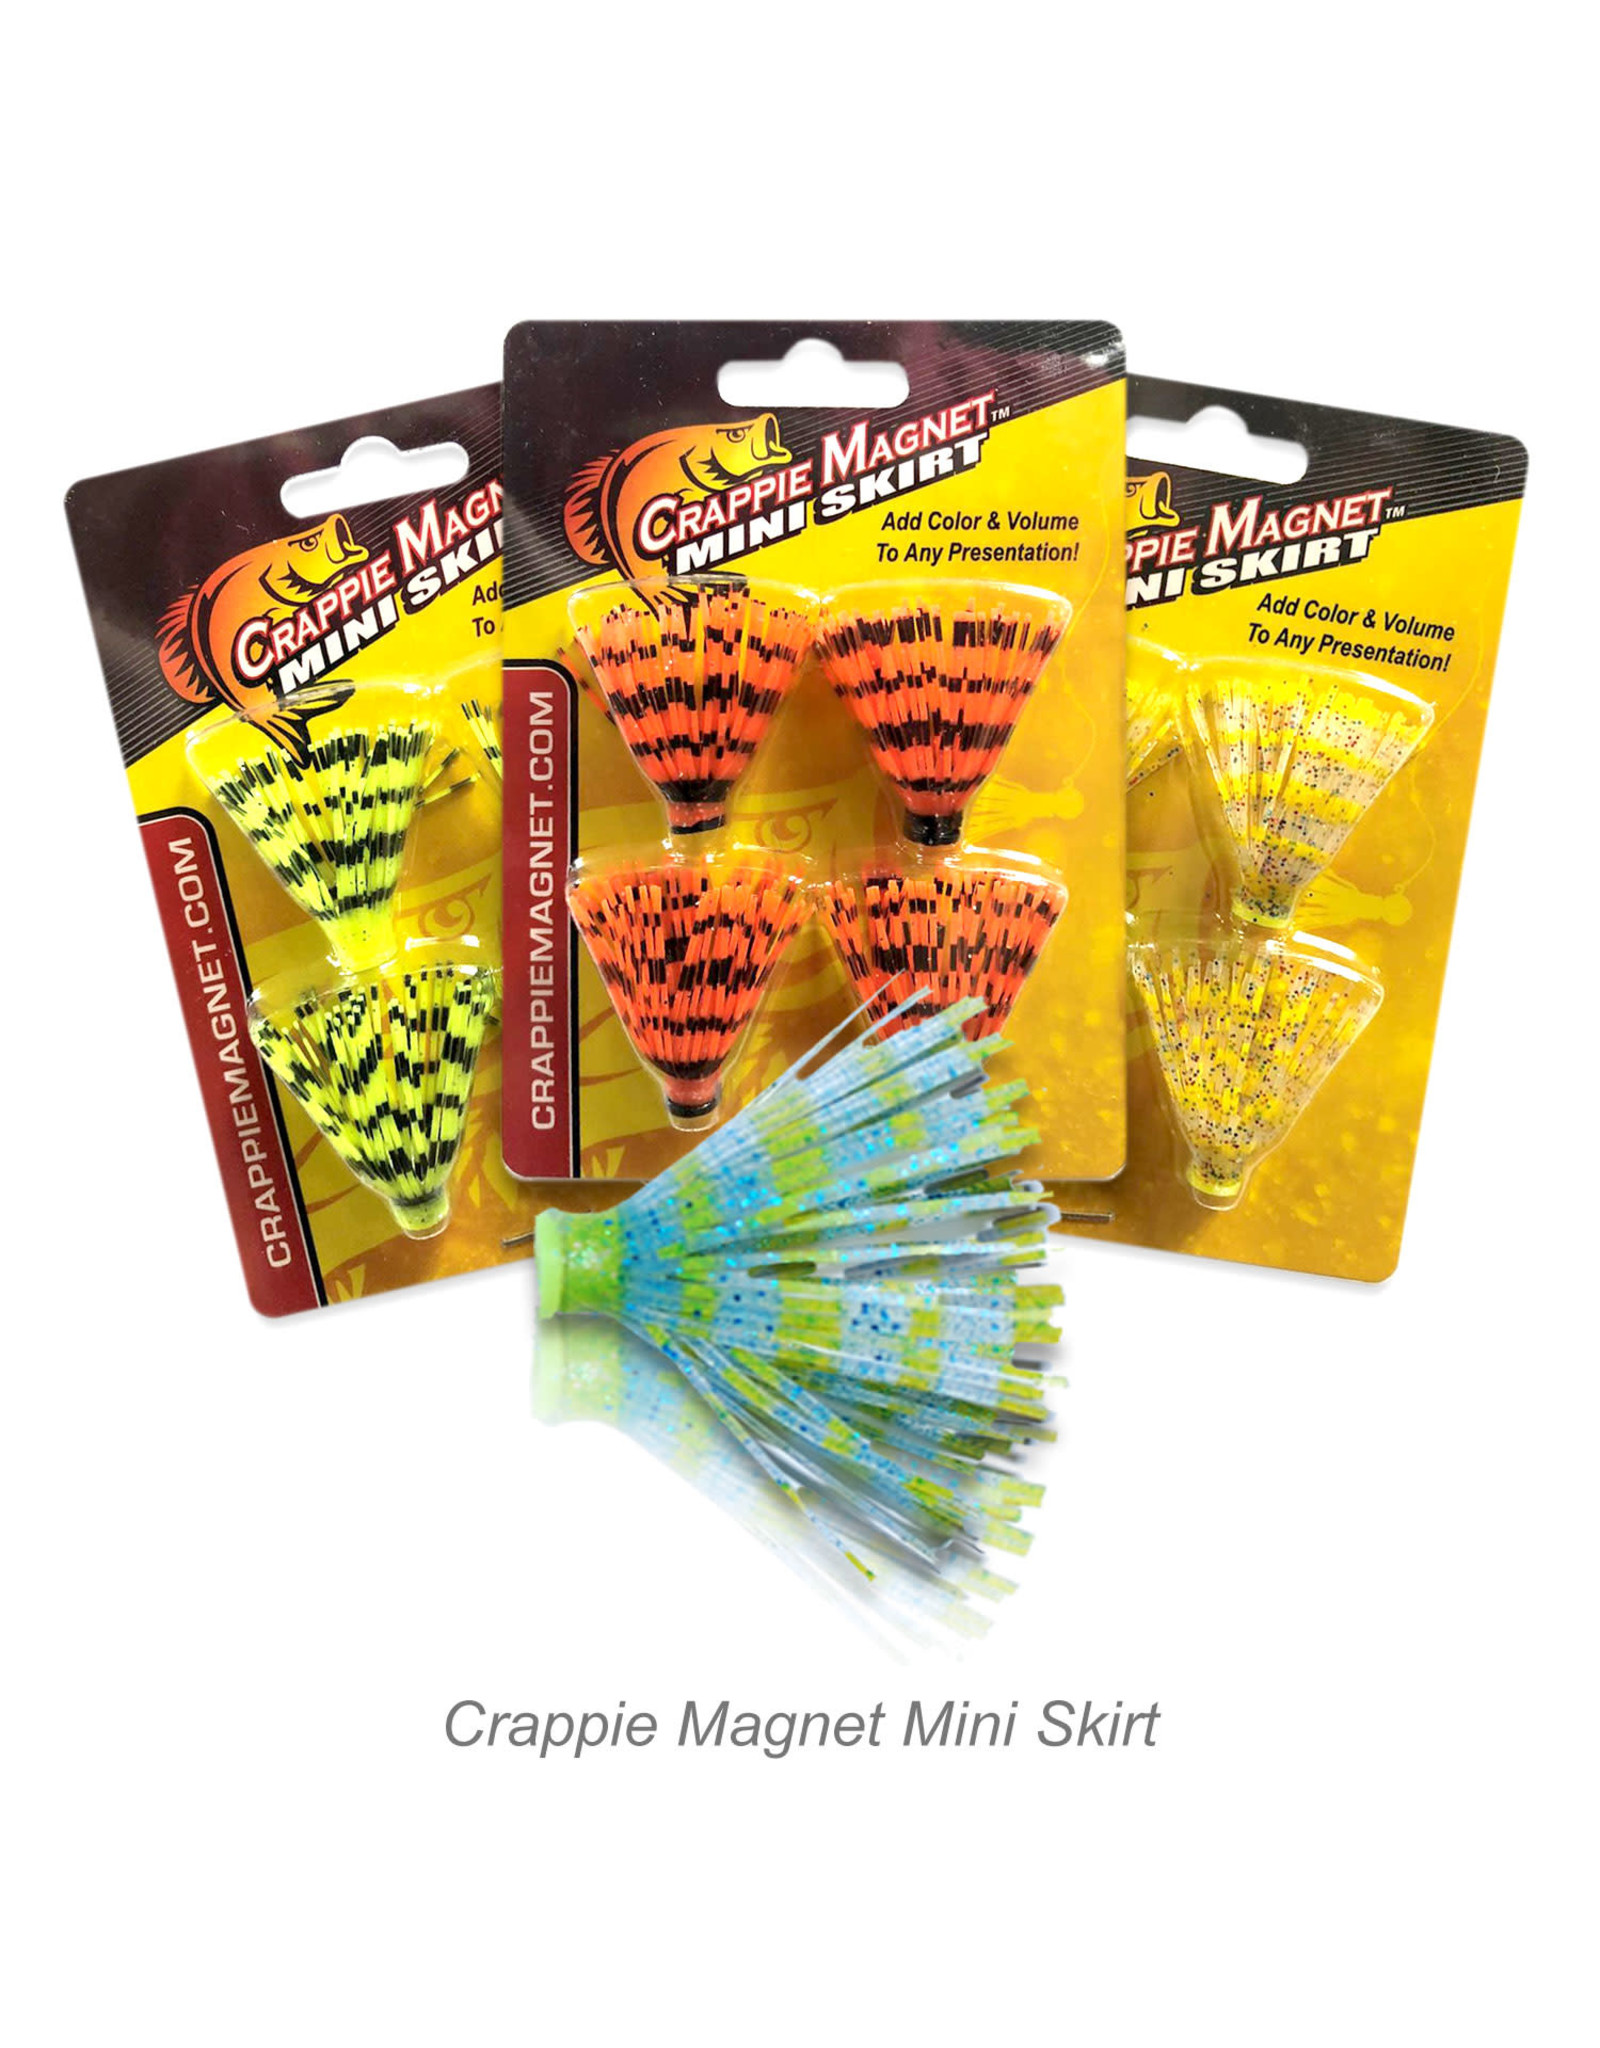 Crappie Magnet Crappie Magnet Mini Skirt